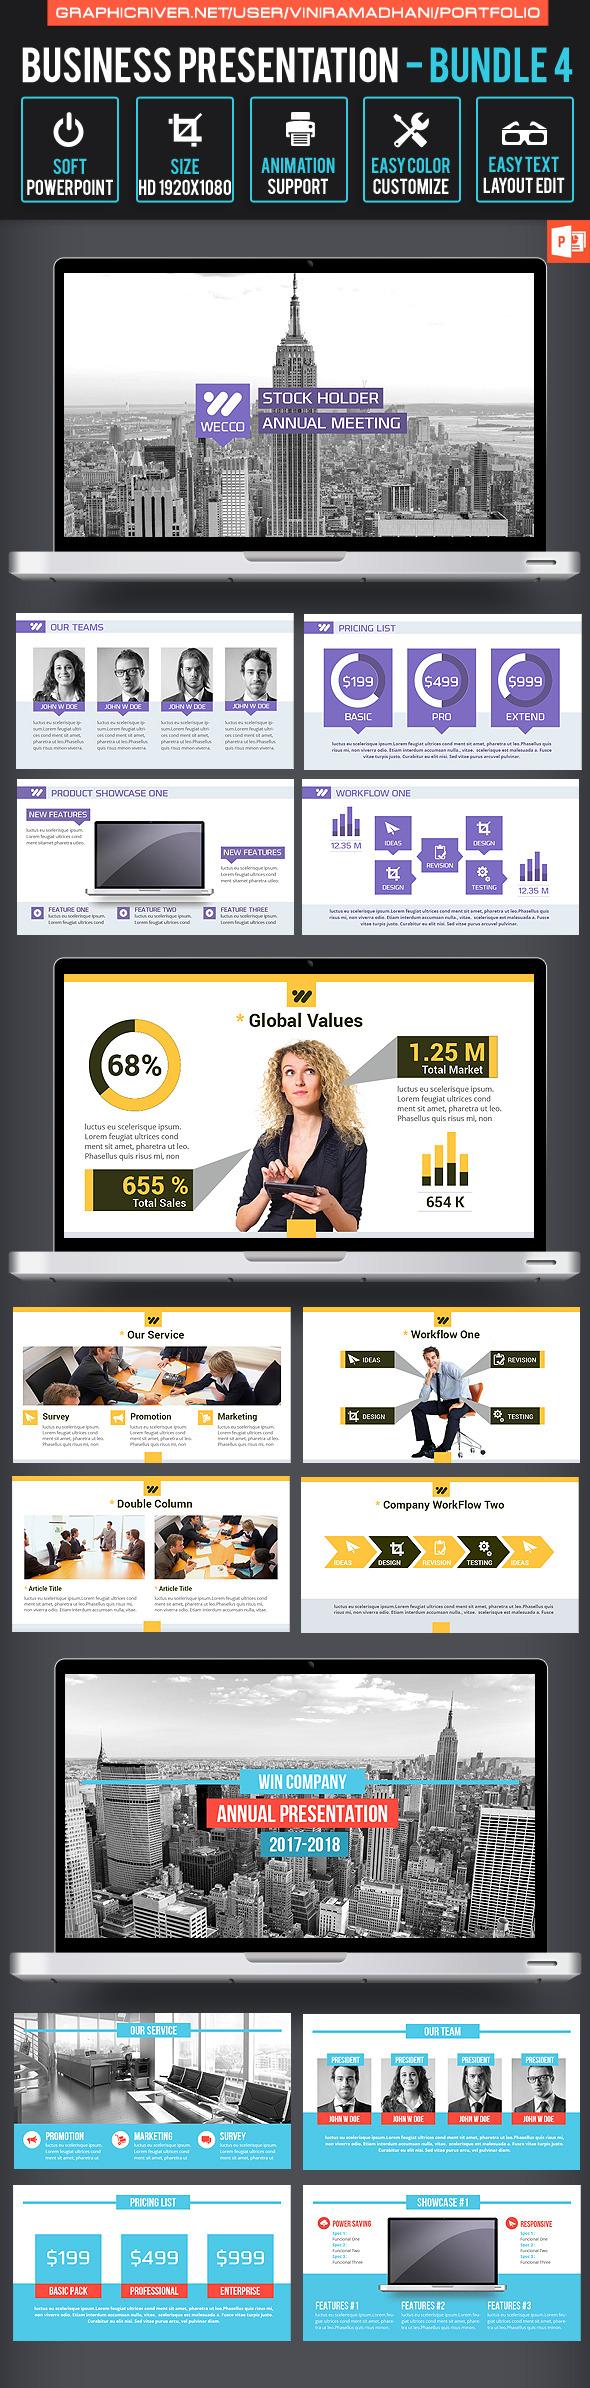 Business Presentation Bundle 4